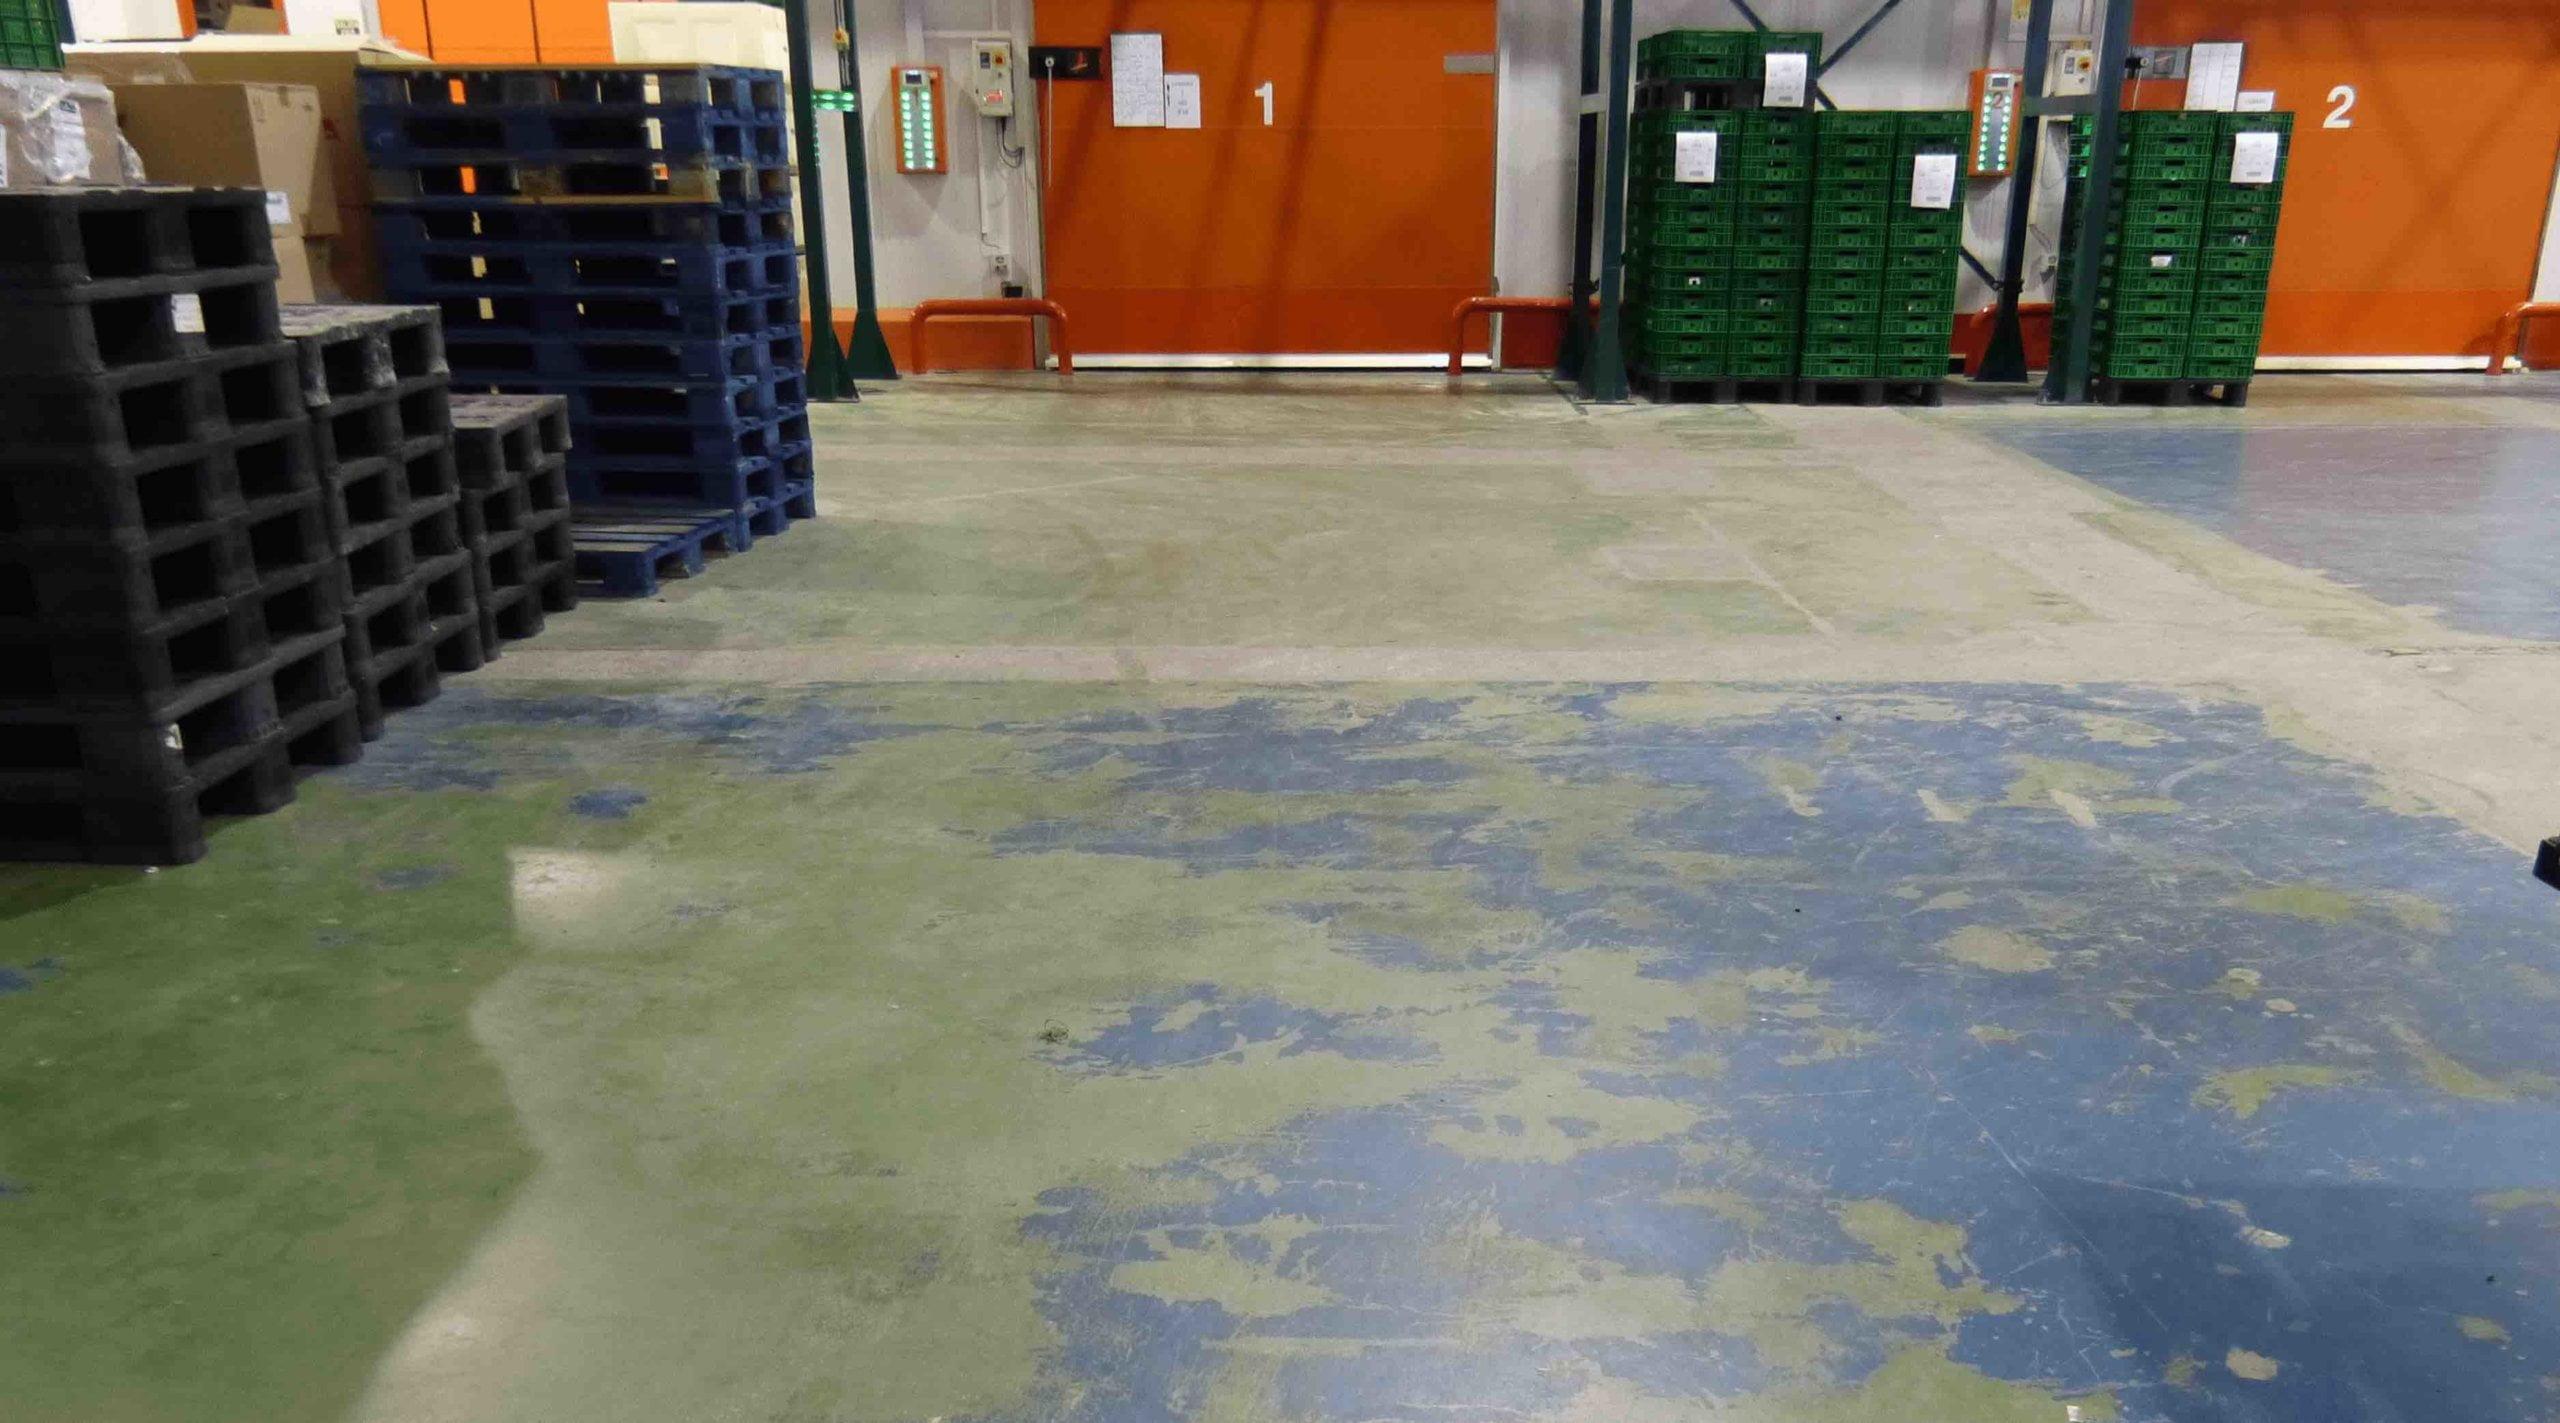 General epoxy floor problems